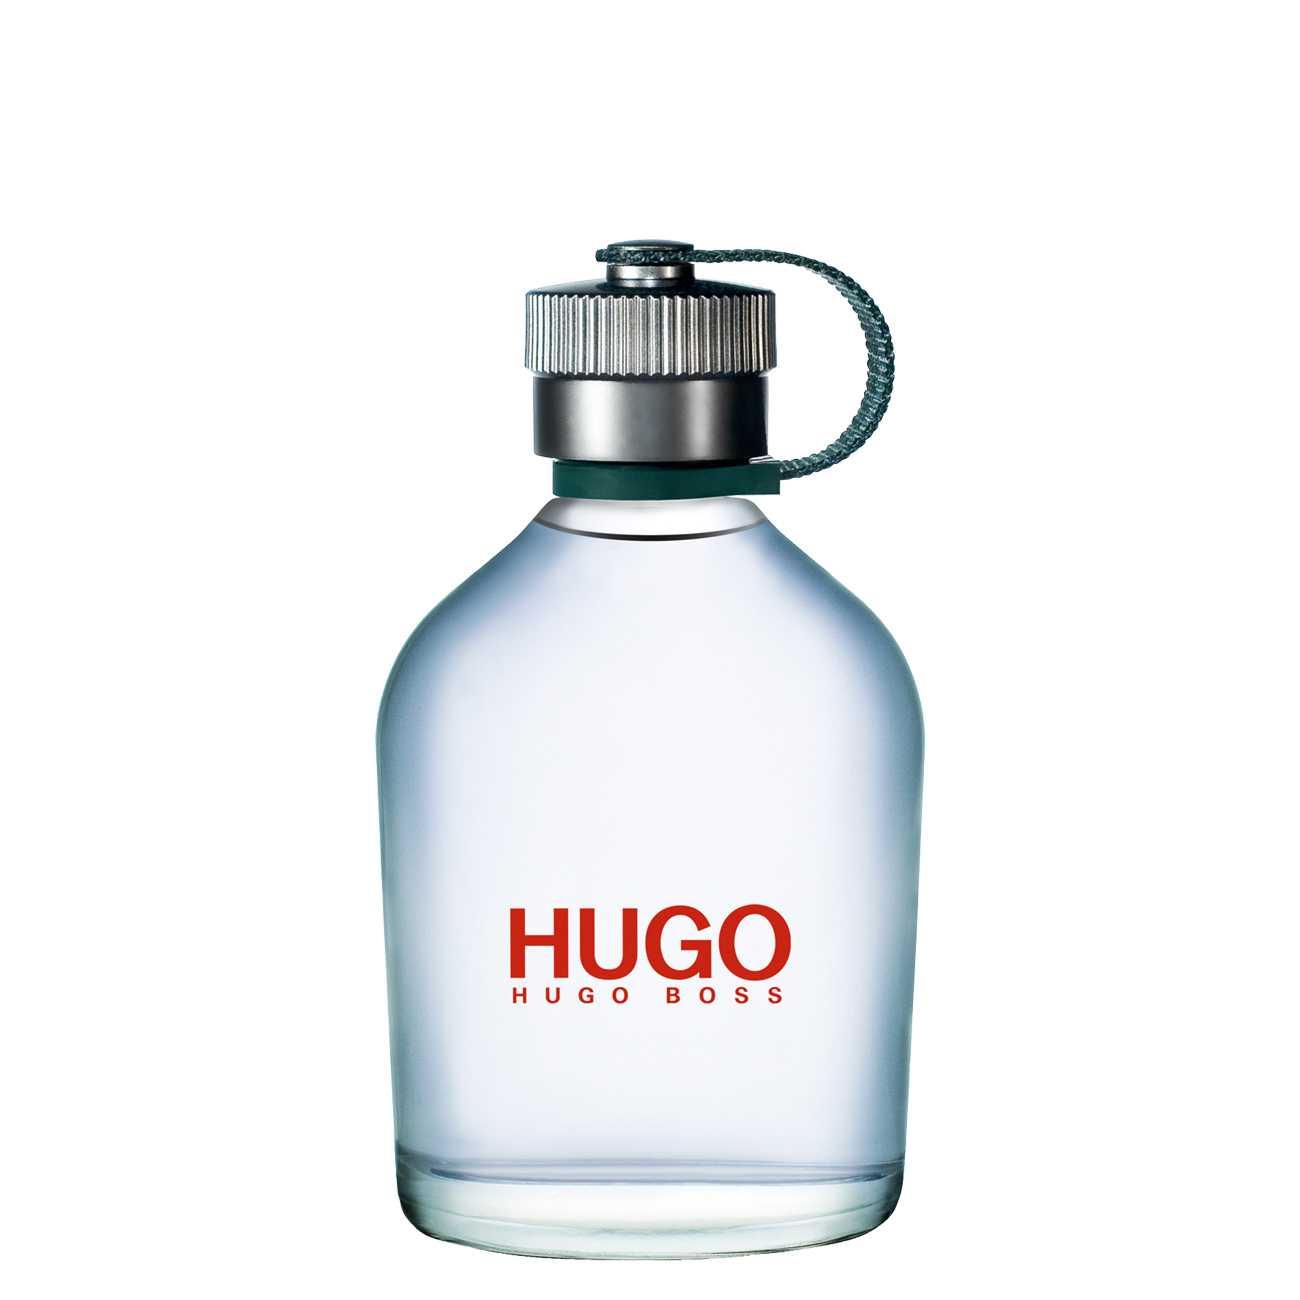 HUGO 125ml